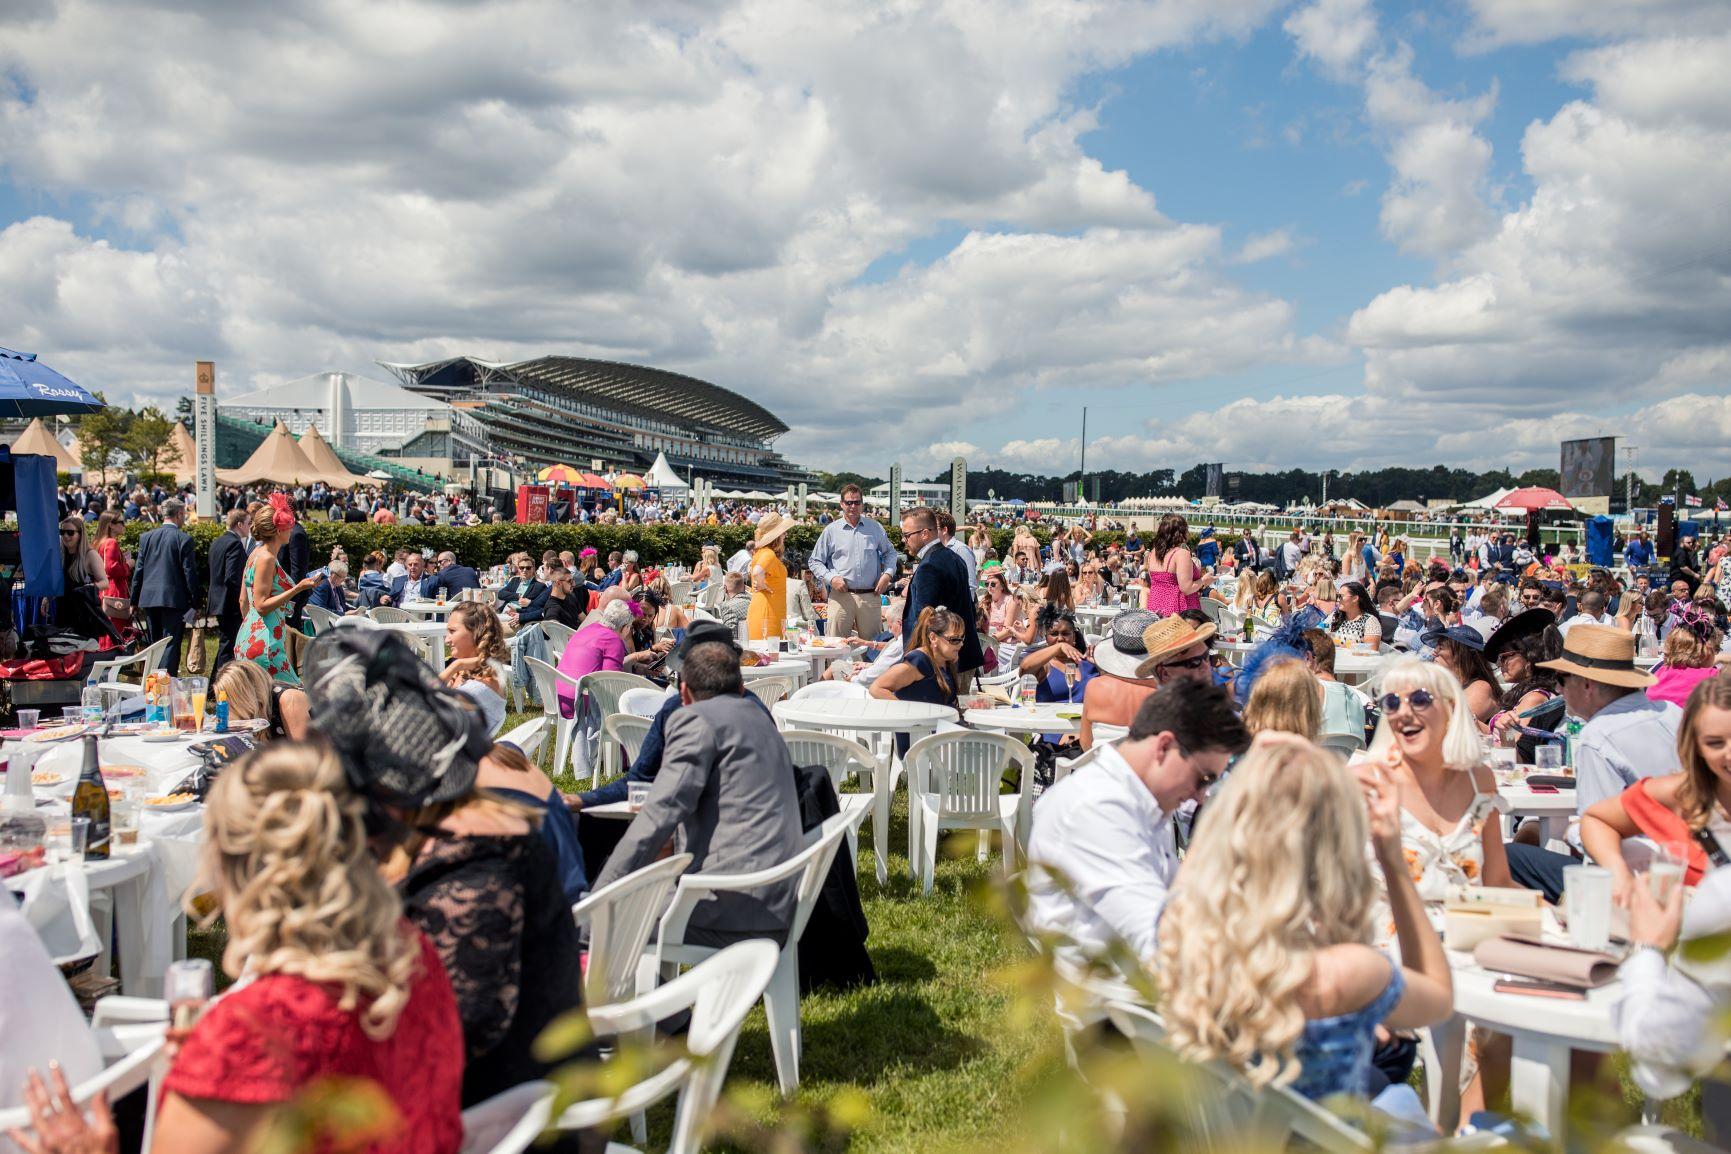 Ascot Race Dates 2021